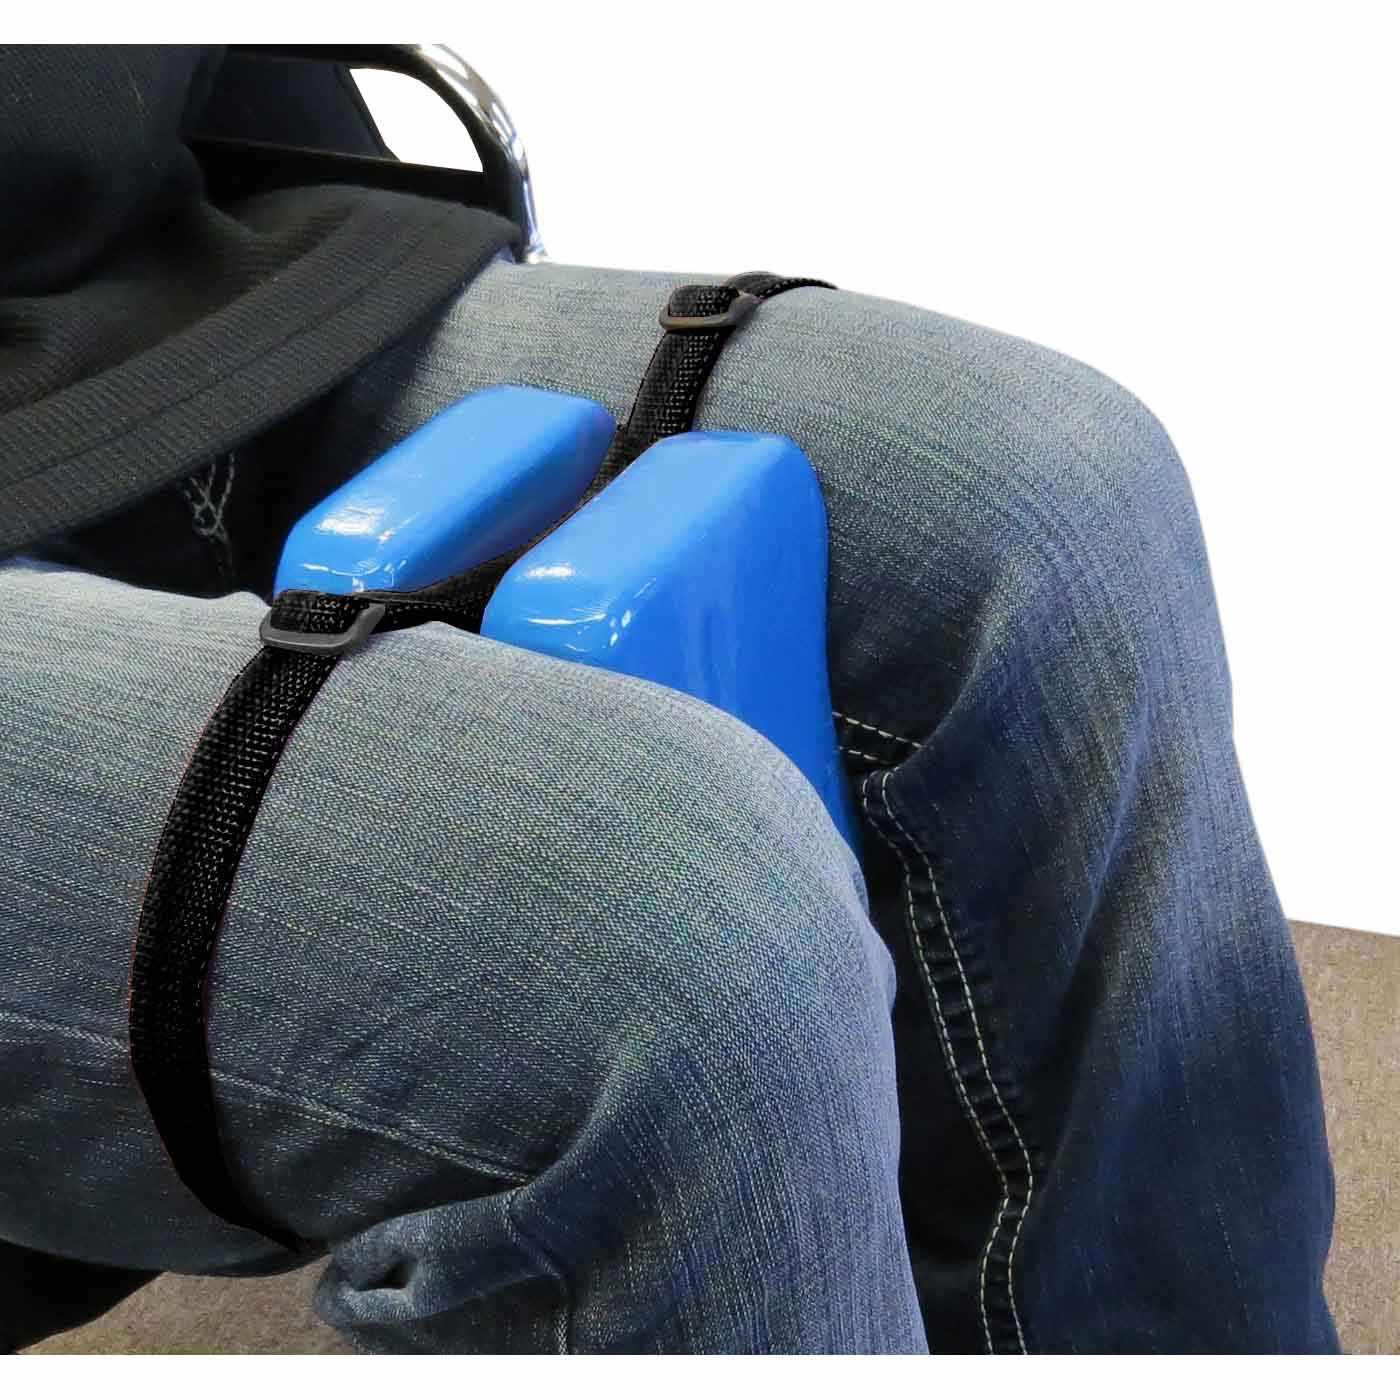 Danmar Portable Abductor | Danmar Products 6925